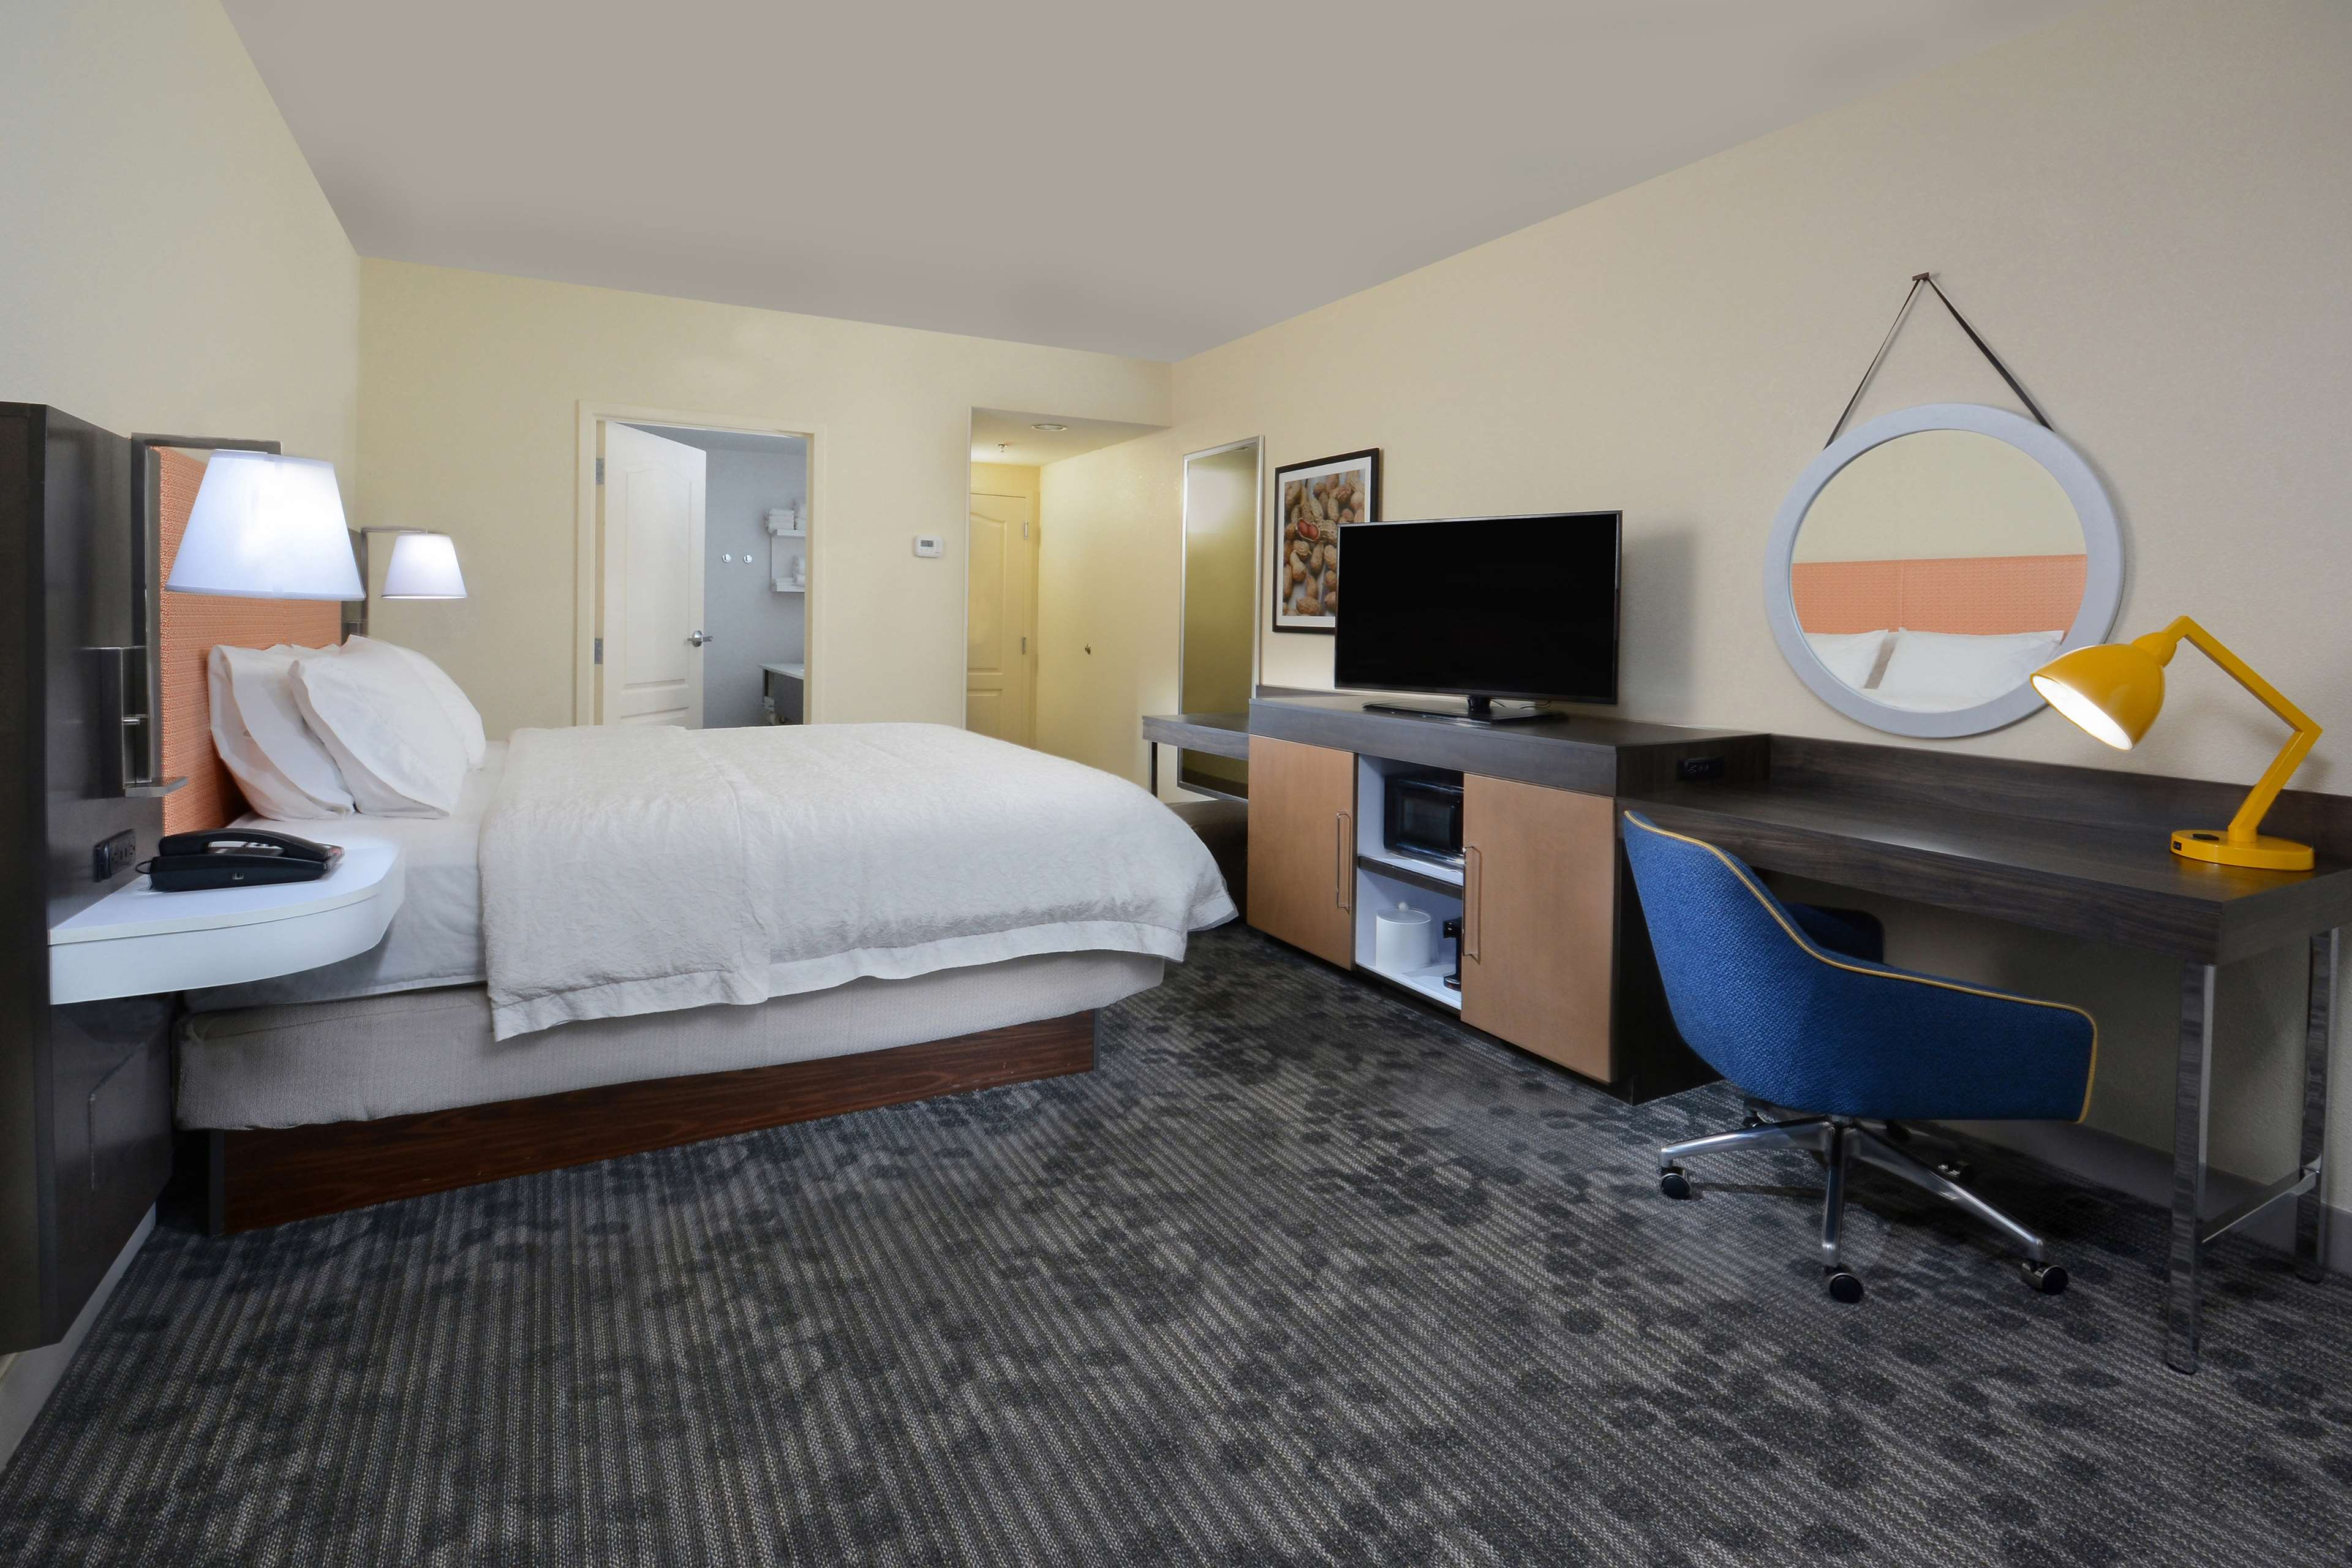 Hampton Inn & Suites Greenville/Spartanburg I-85 image 34